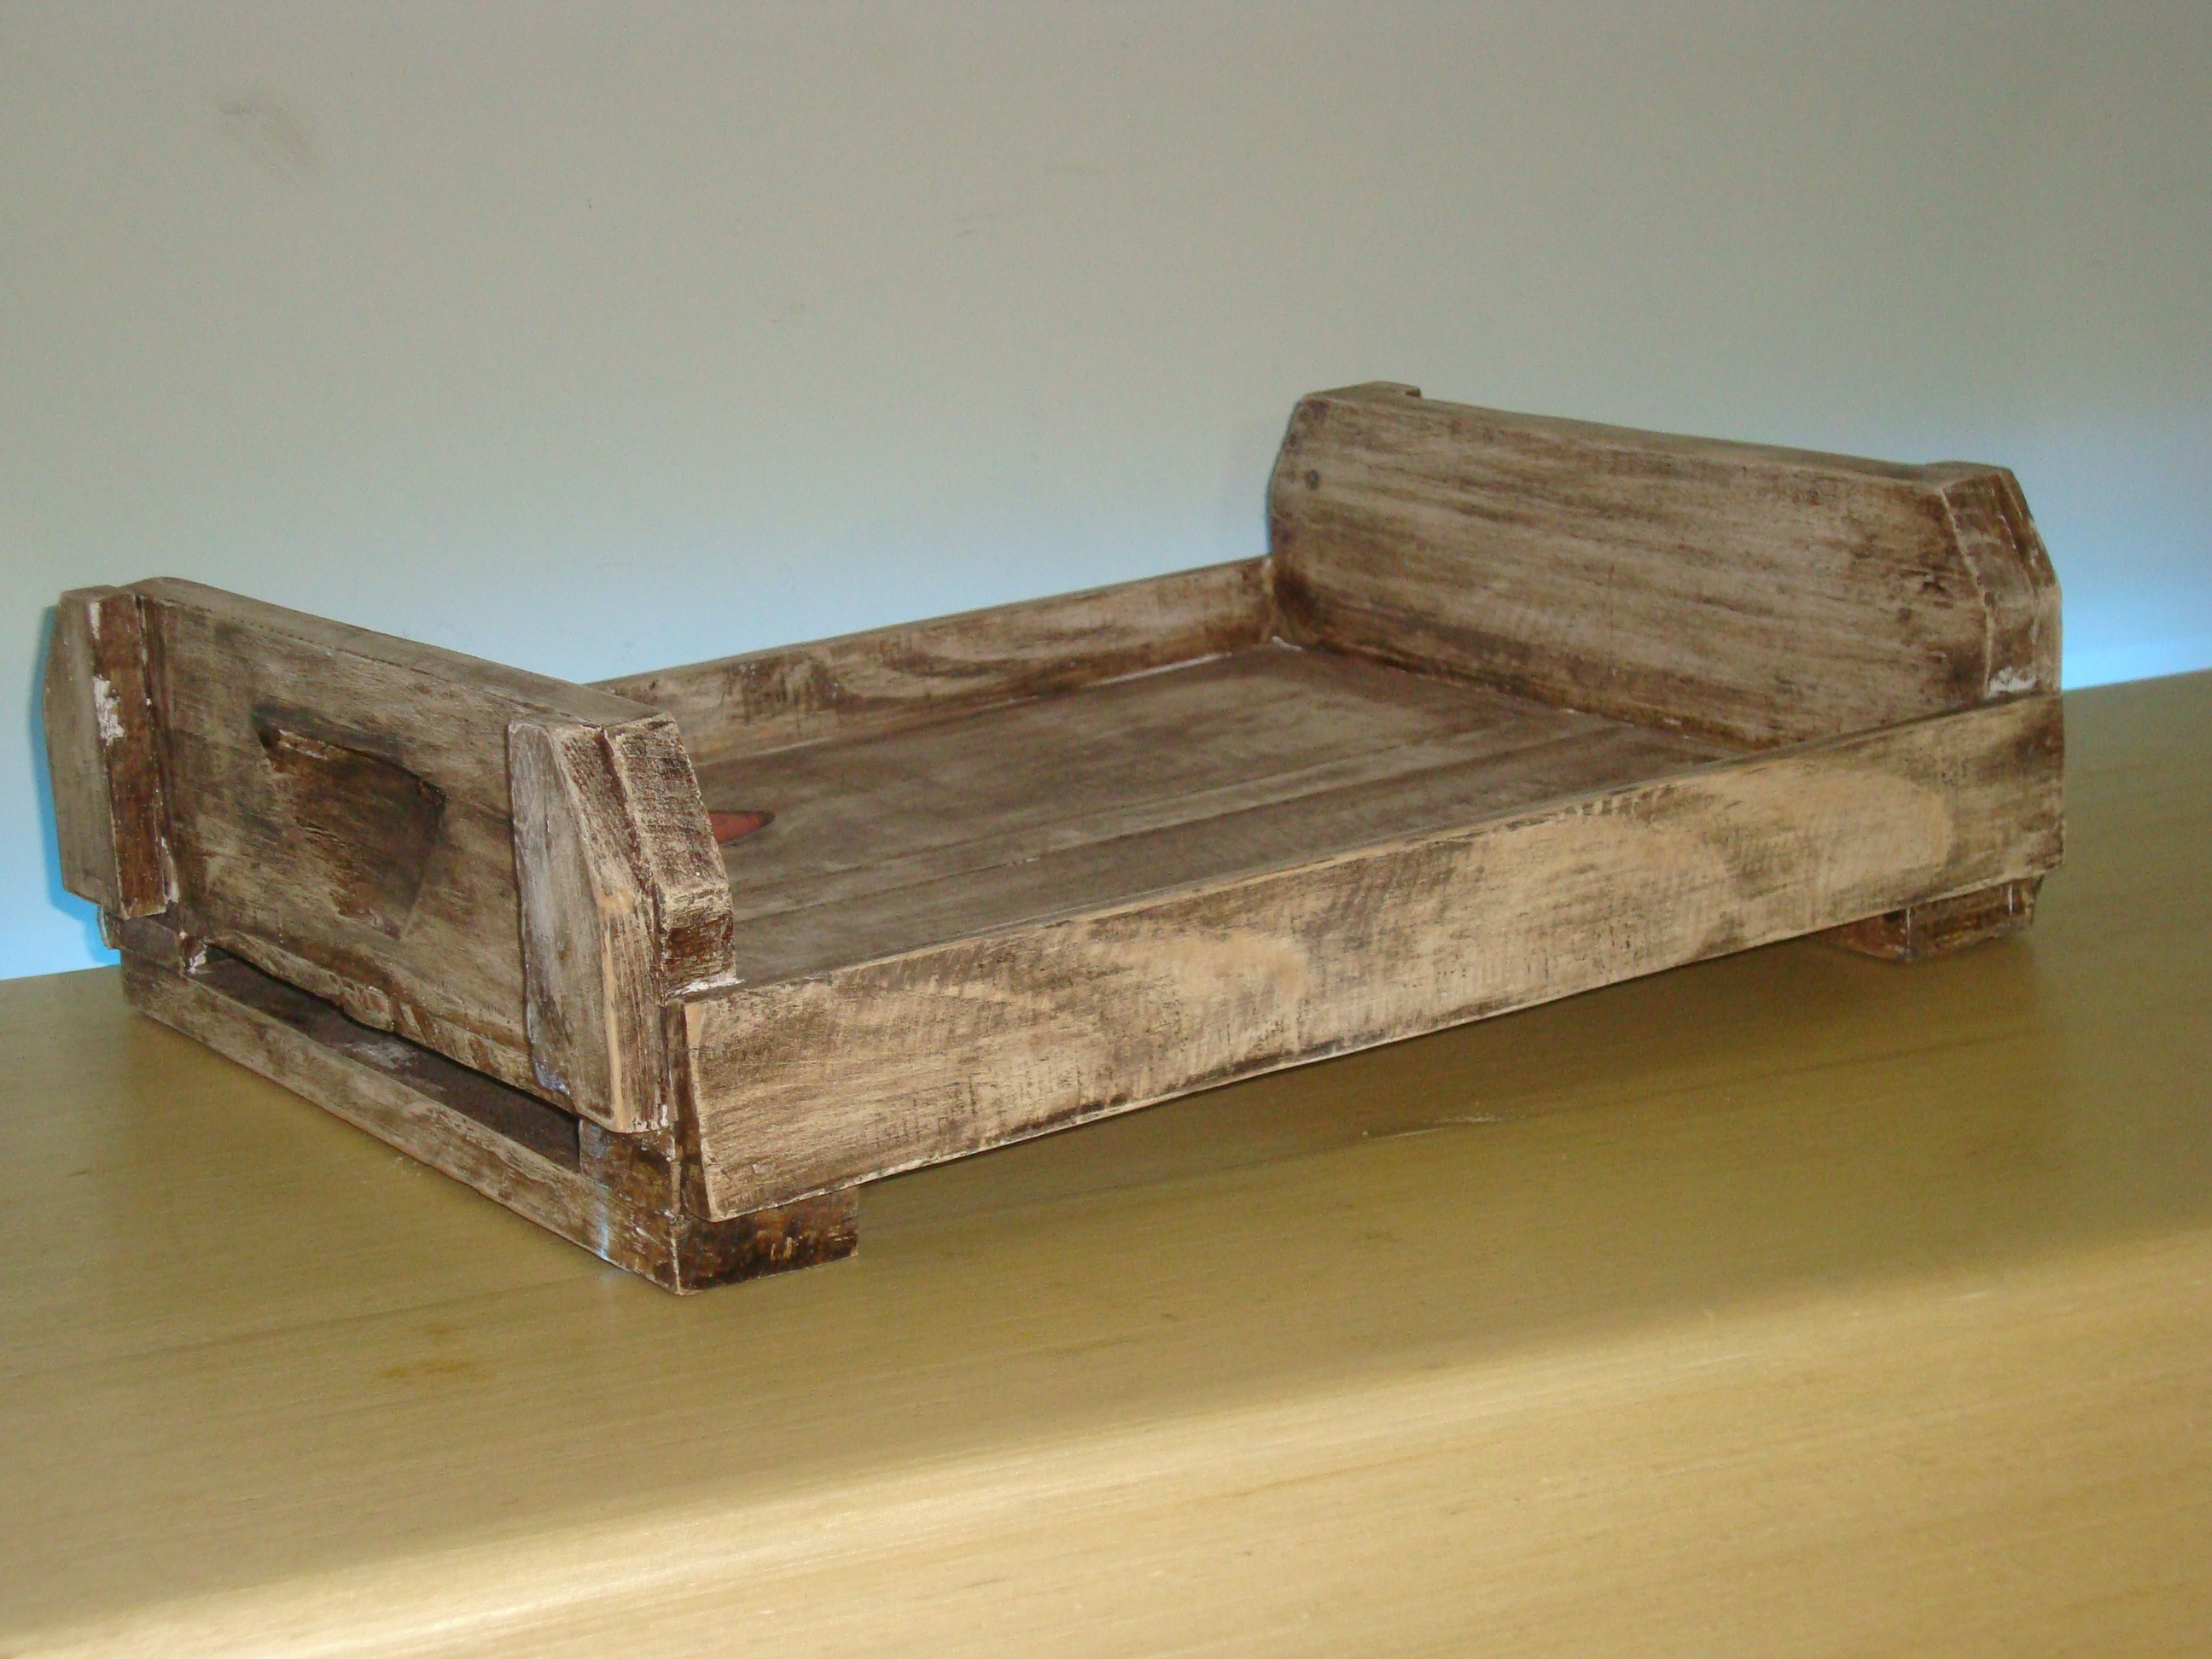 de madeira bandeja de madeira bandeja de madeira bandeja de madeira  #91763A 2592x1944